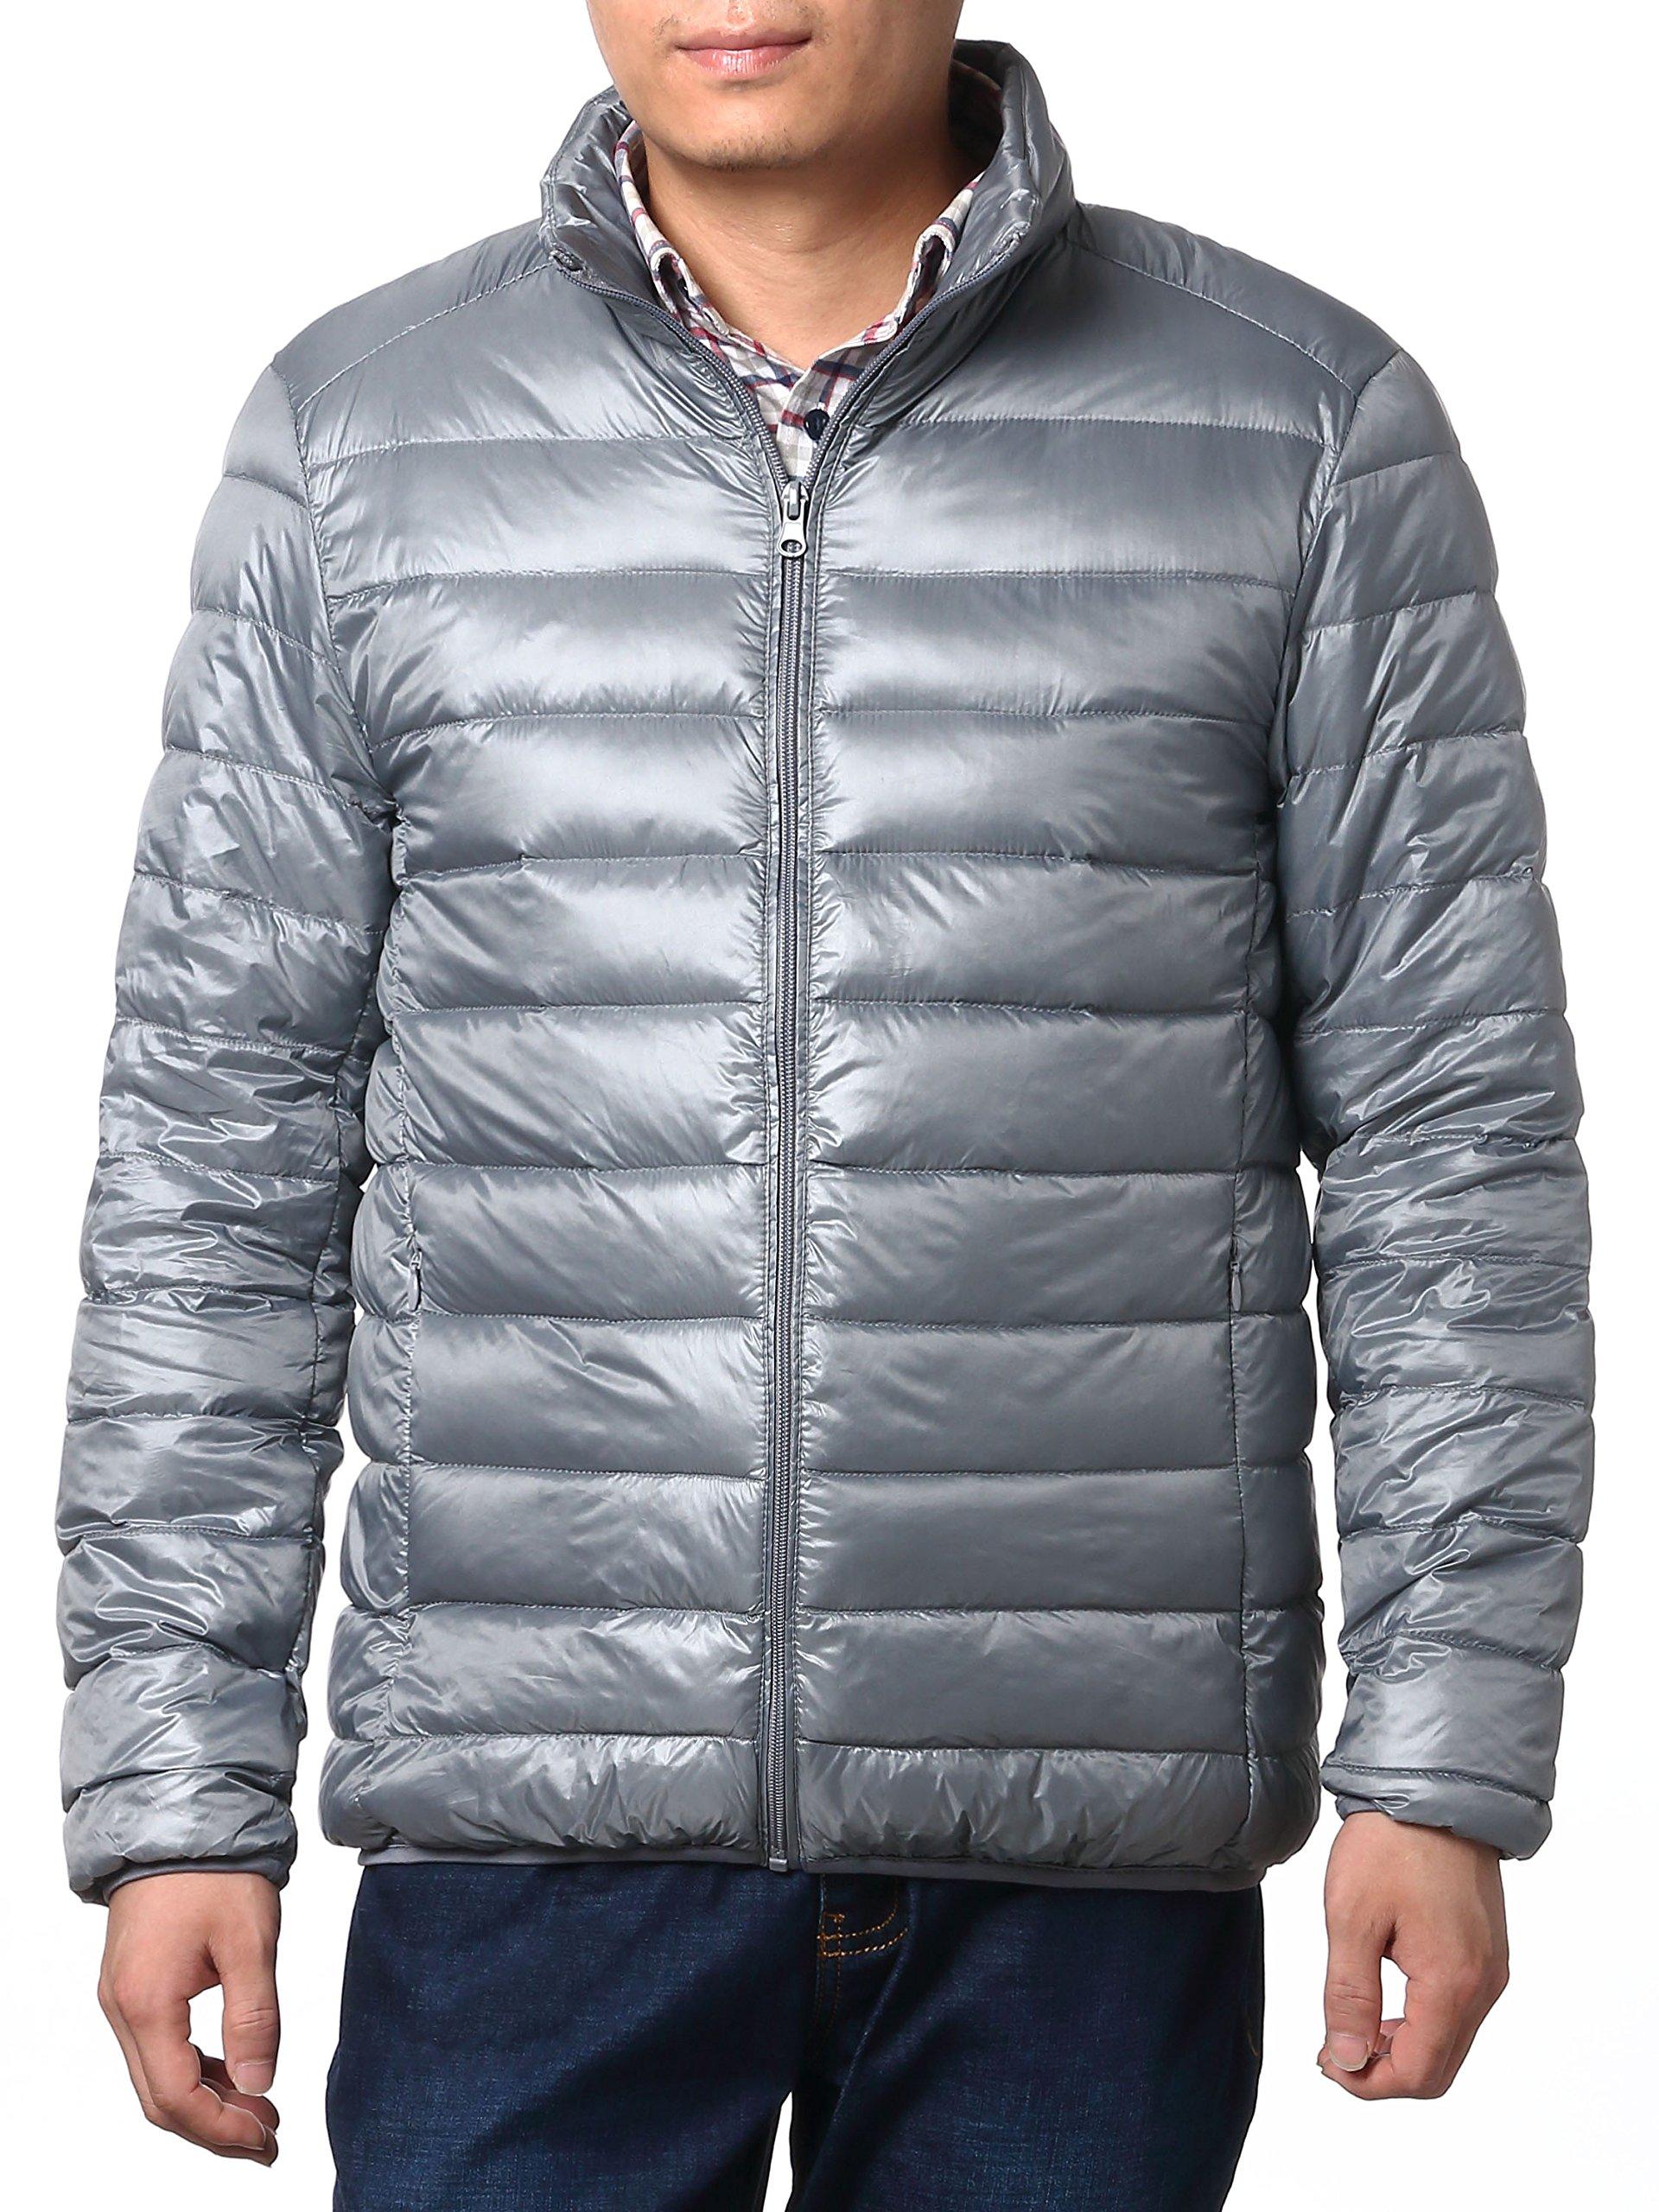 Multicolor Jackets Lightweight Puffer Jacket,Packable Down Jacket for Men (XXL, Sliver)